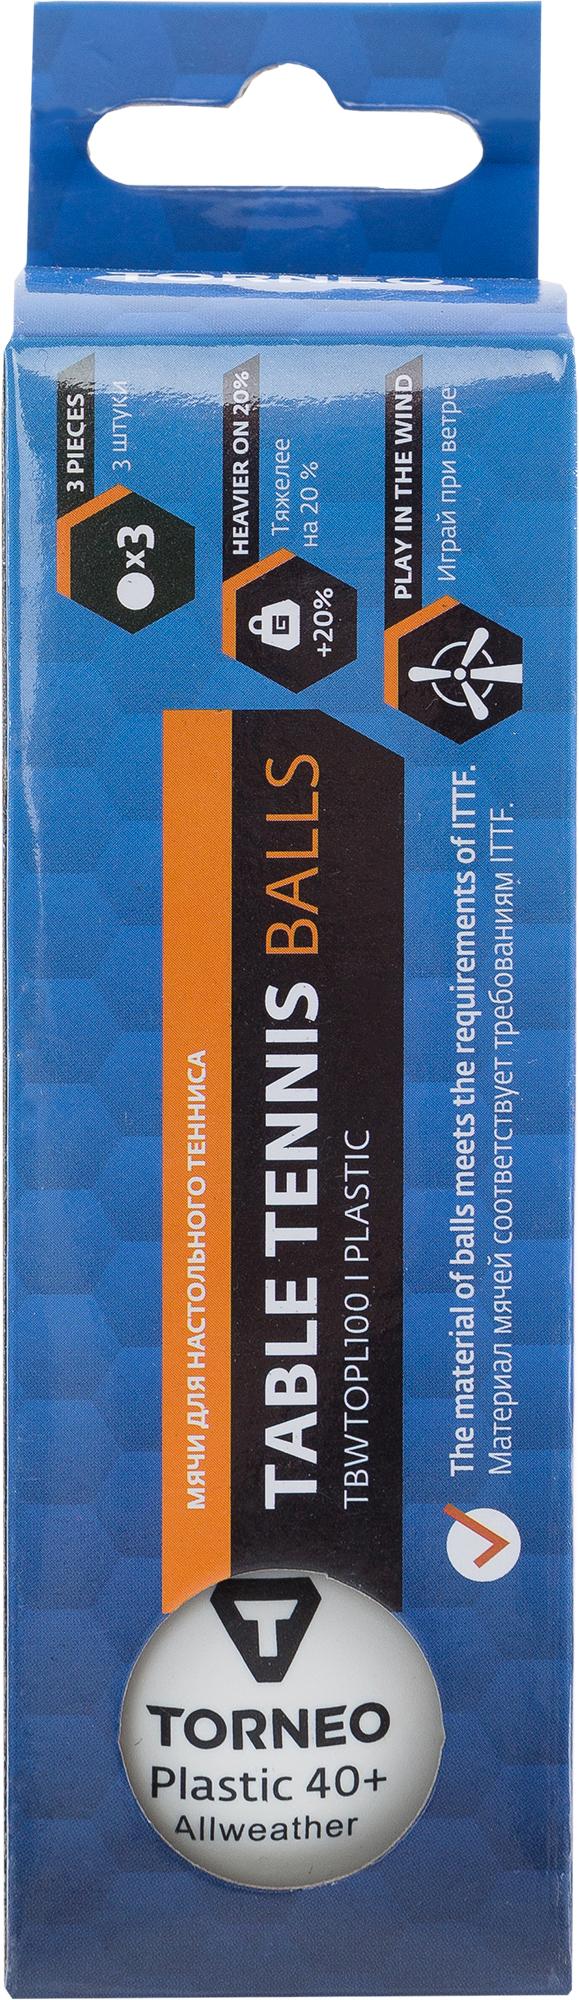 Torneo Набор мячей для настольного тенниса Torneo, 3 шт цена